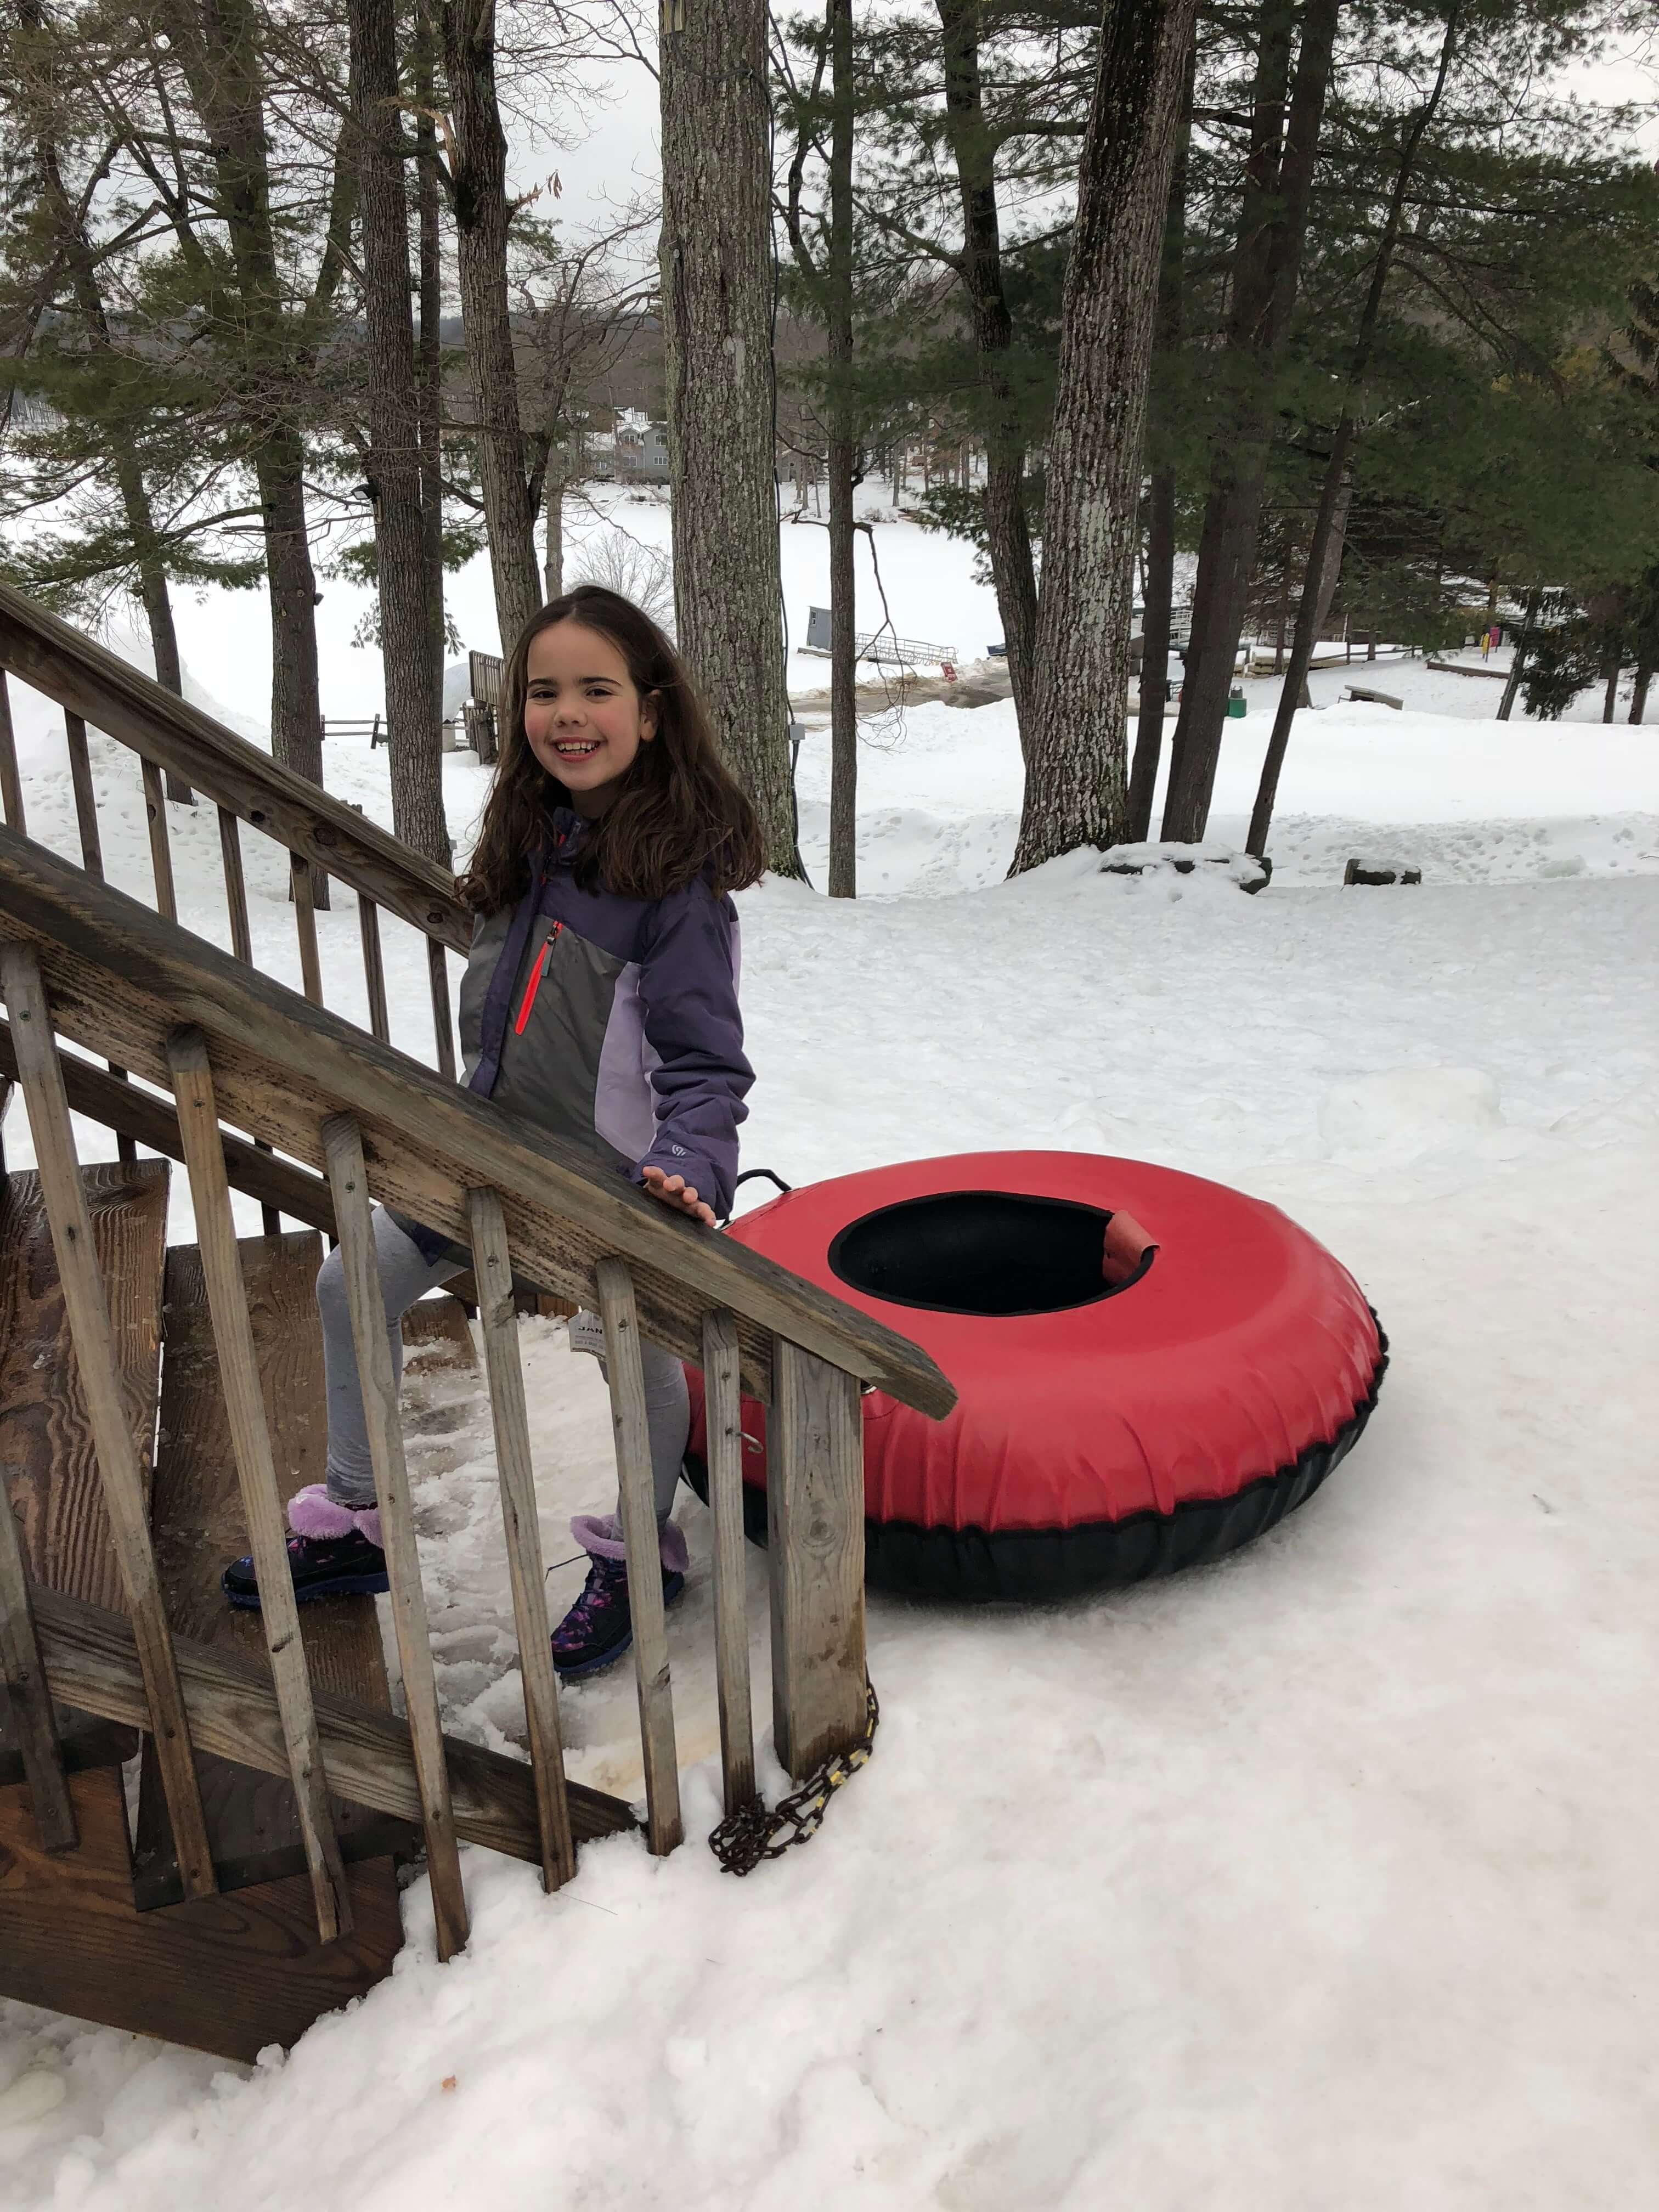 snow tubing fun at woodloch